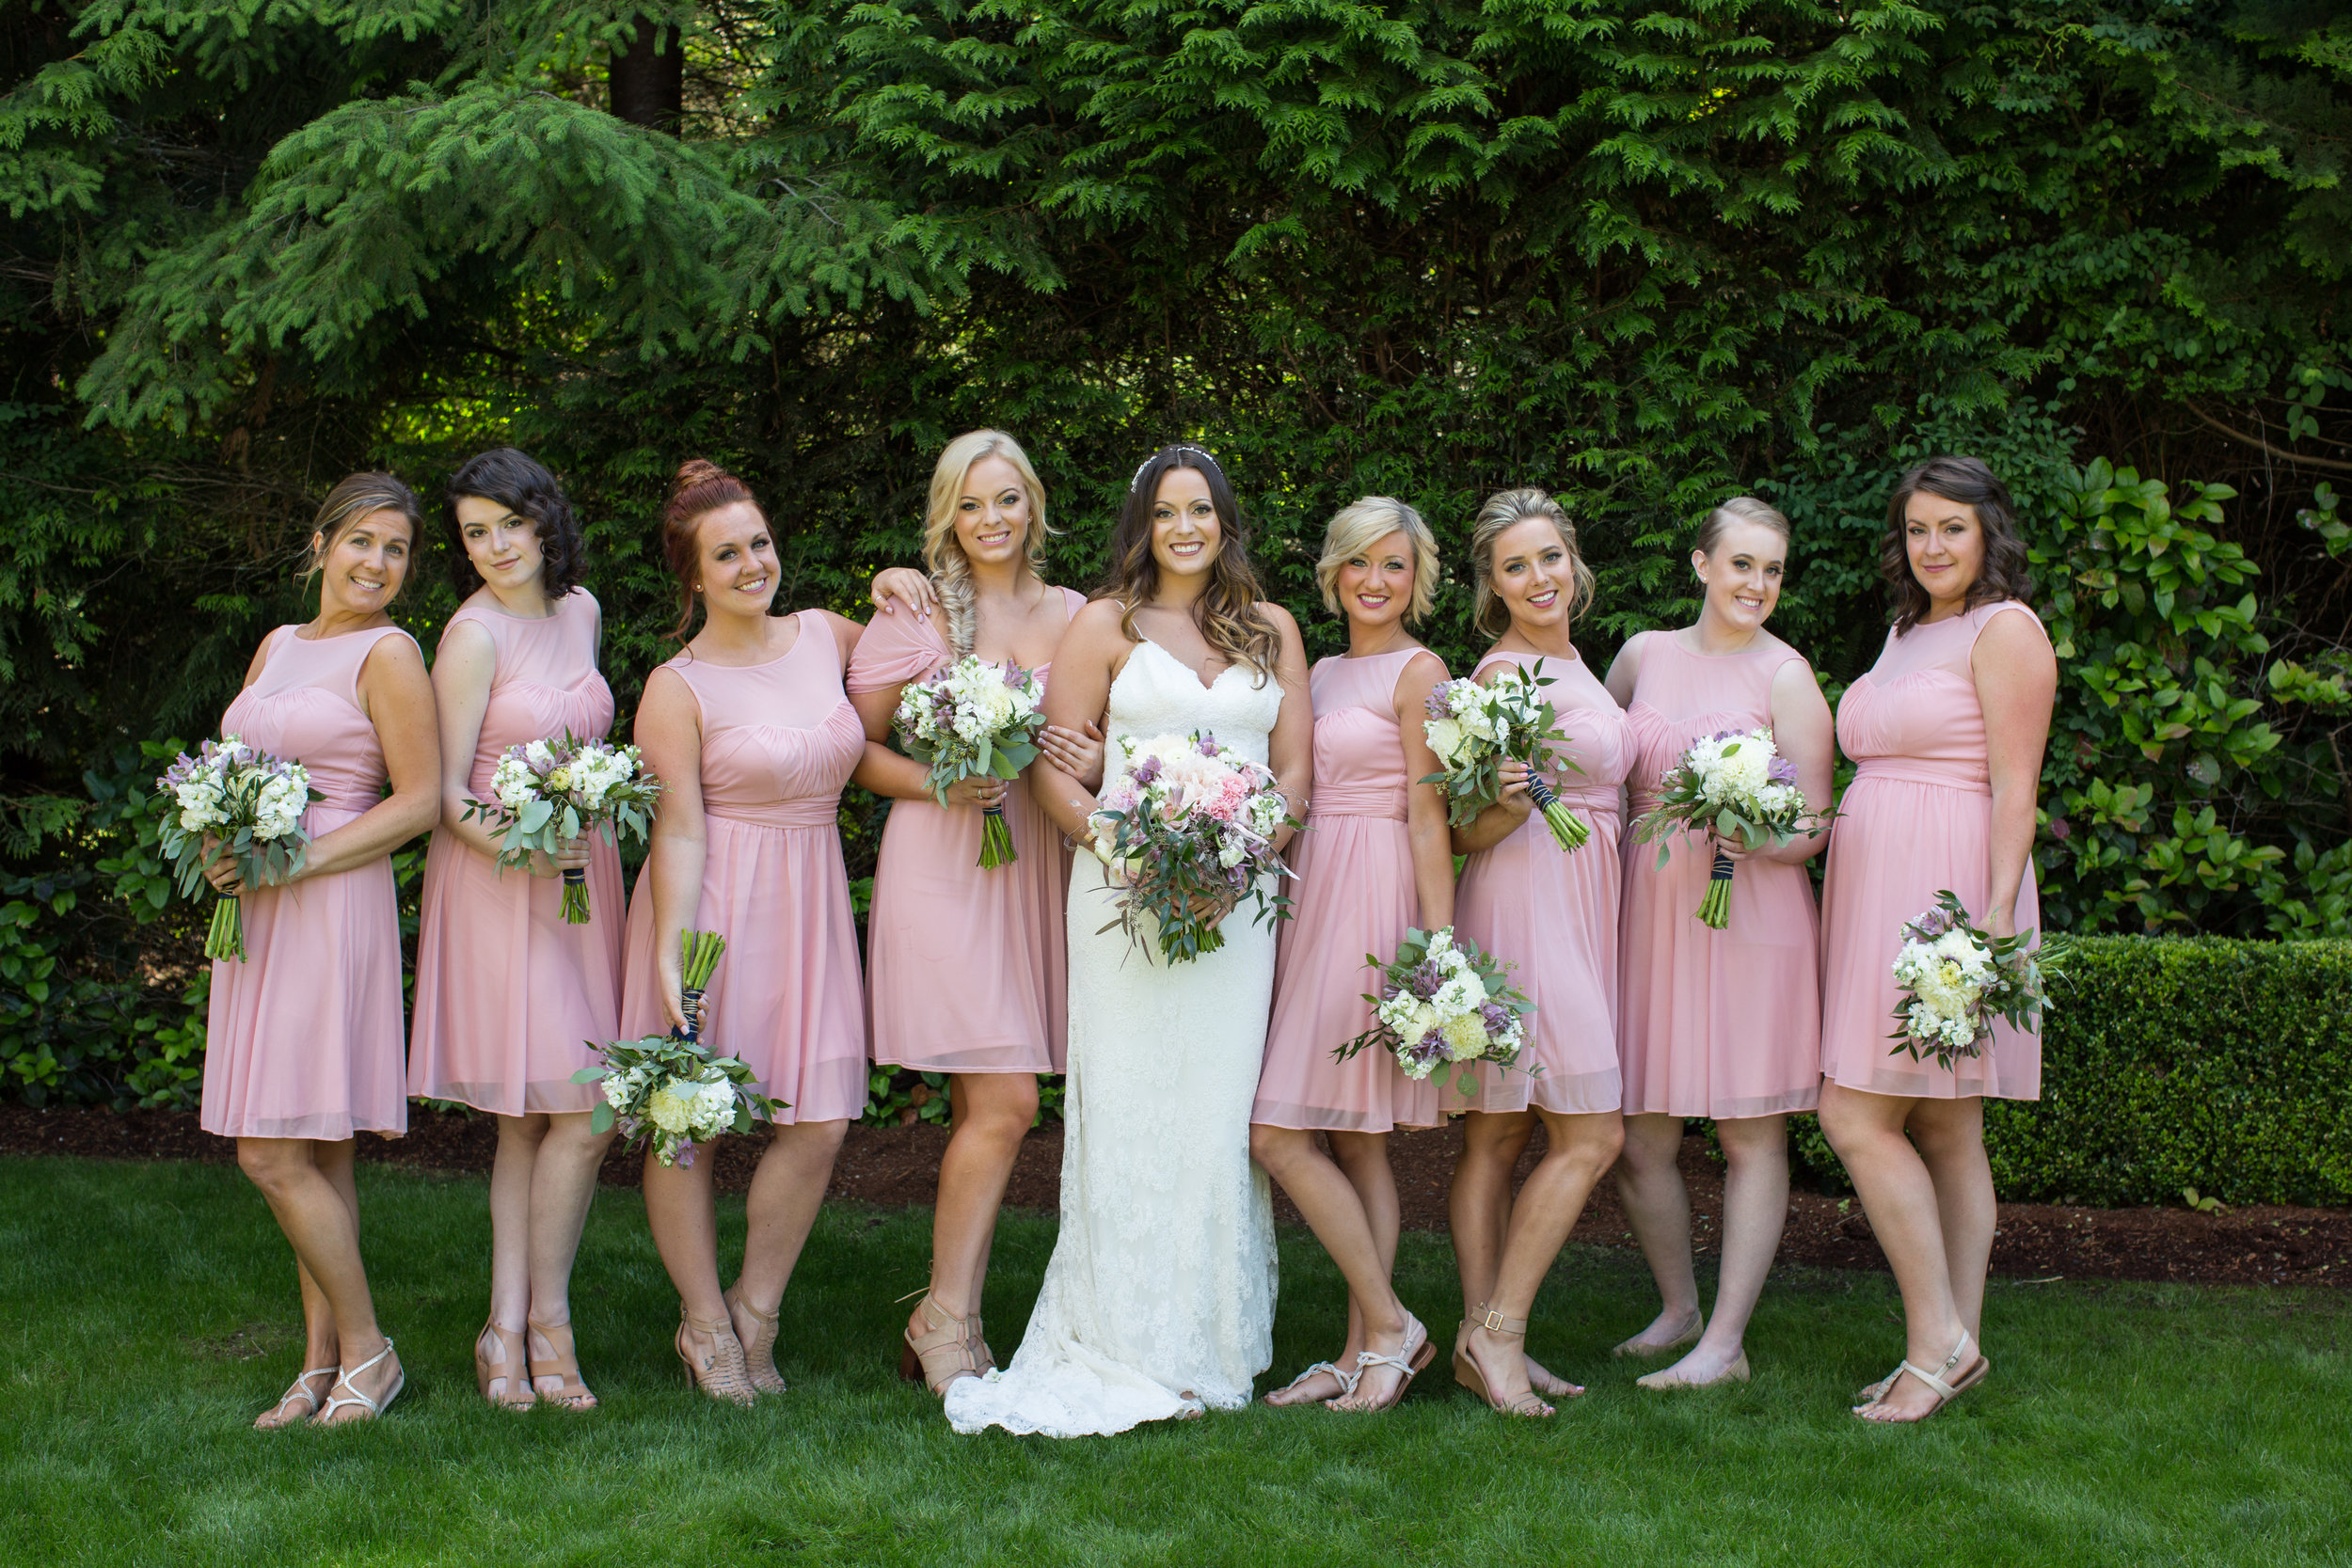 sandstrom_wedding_116.jpg